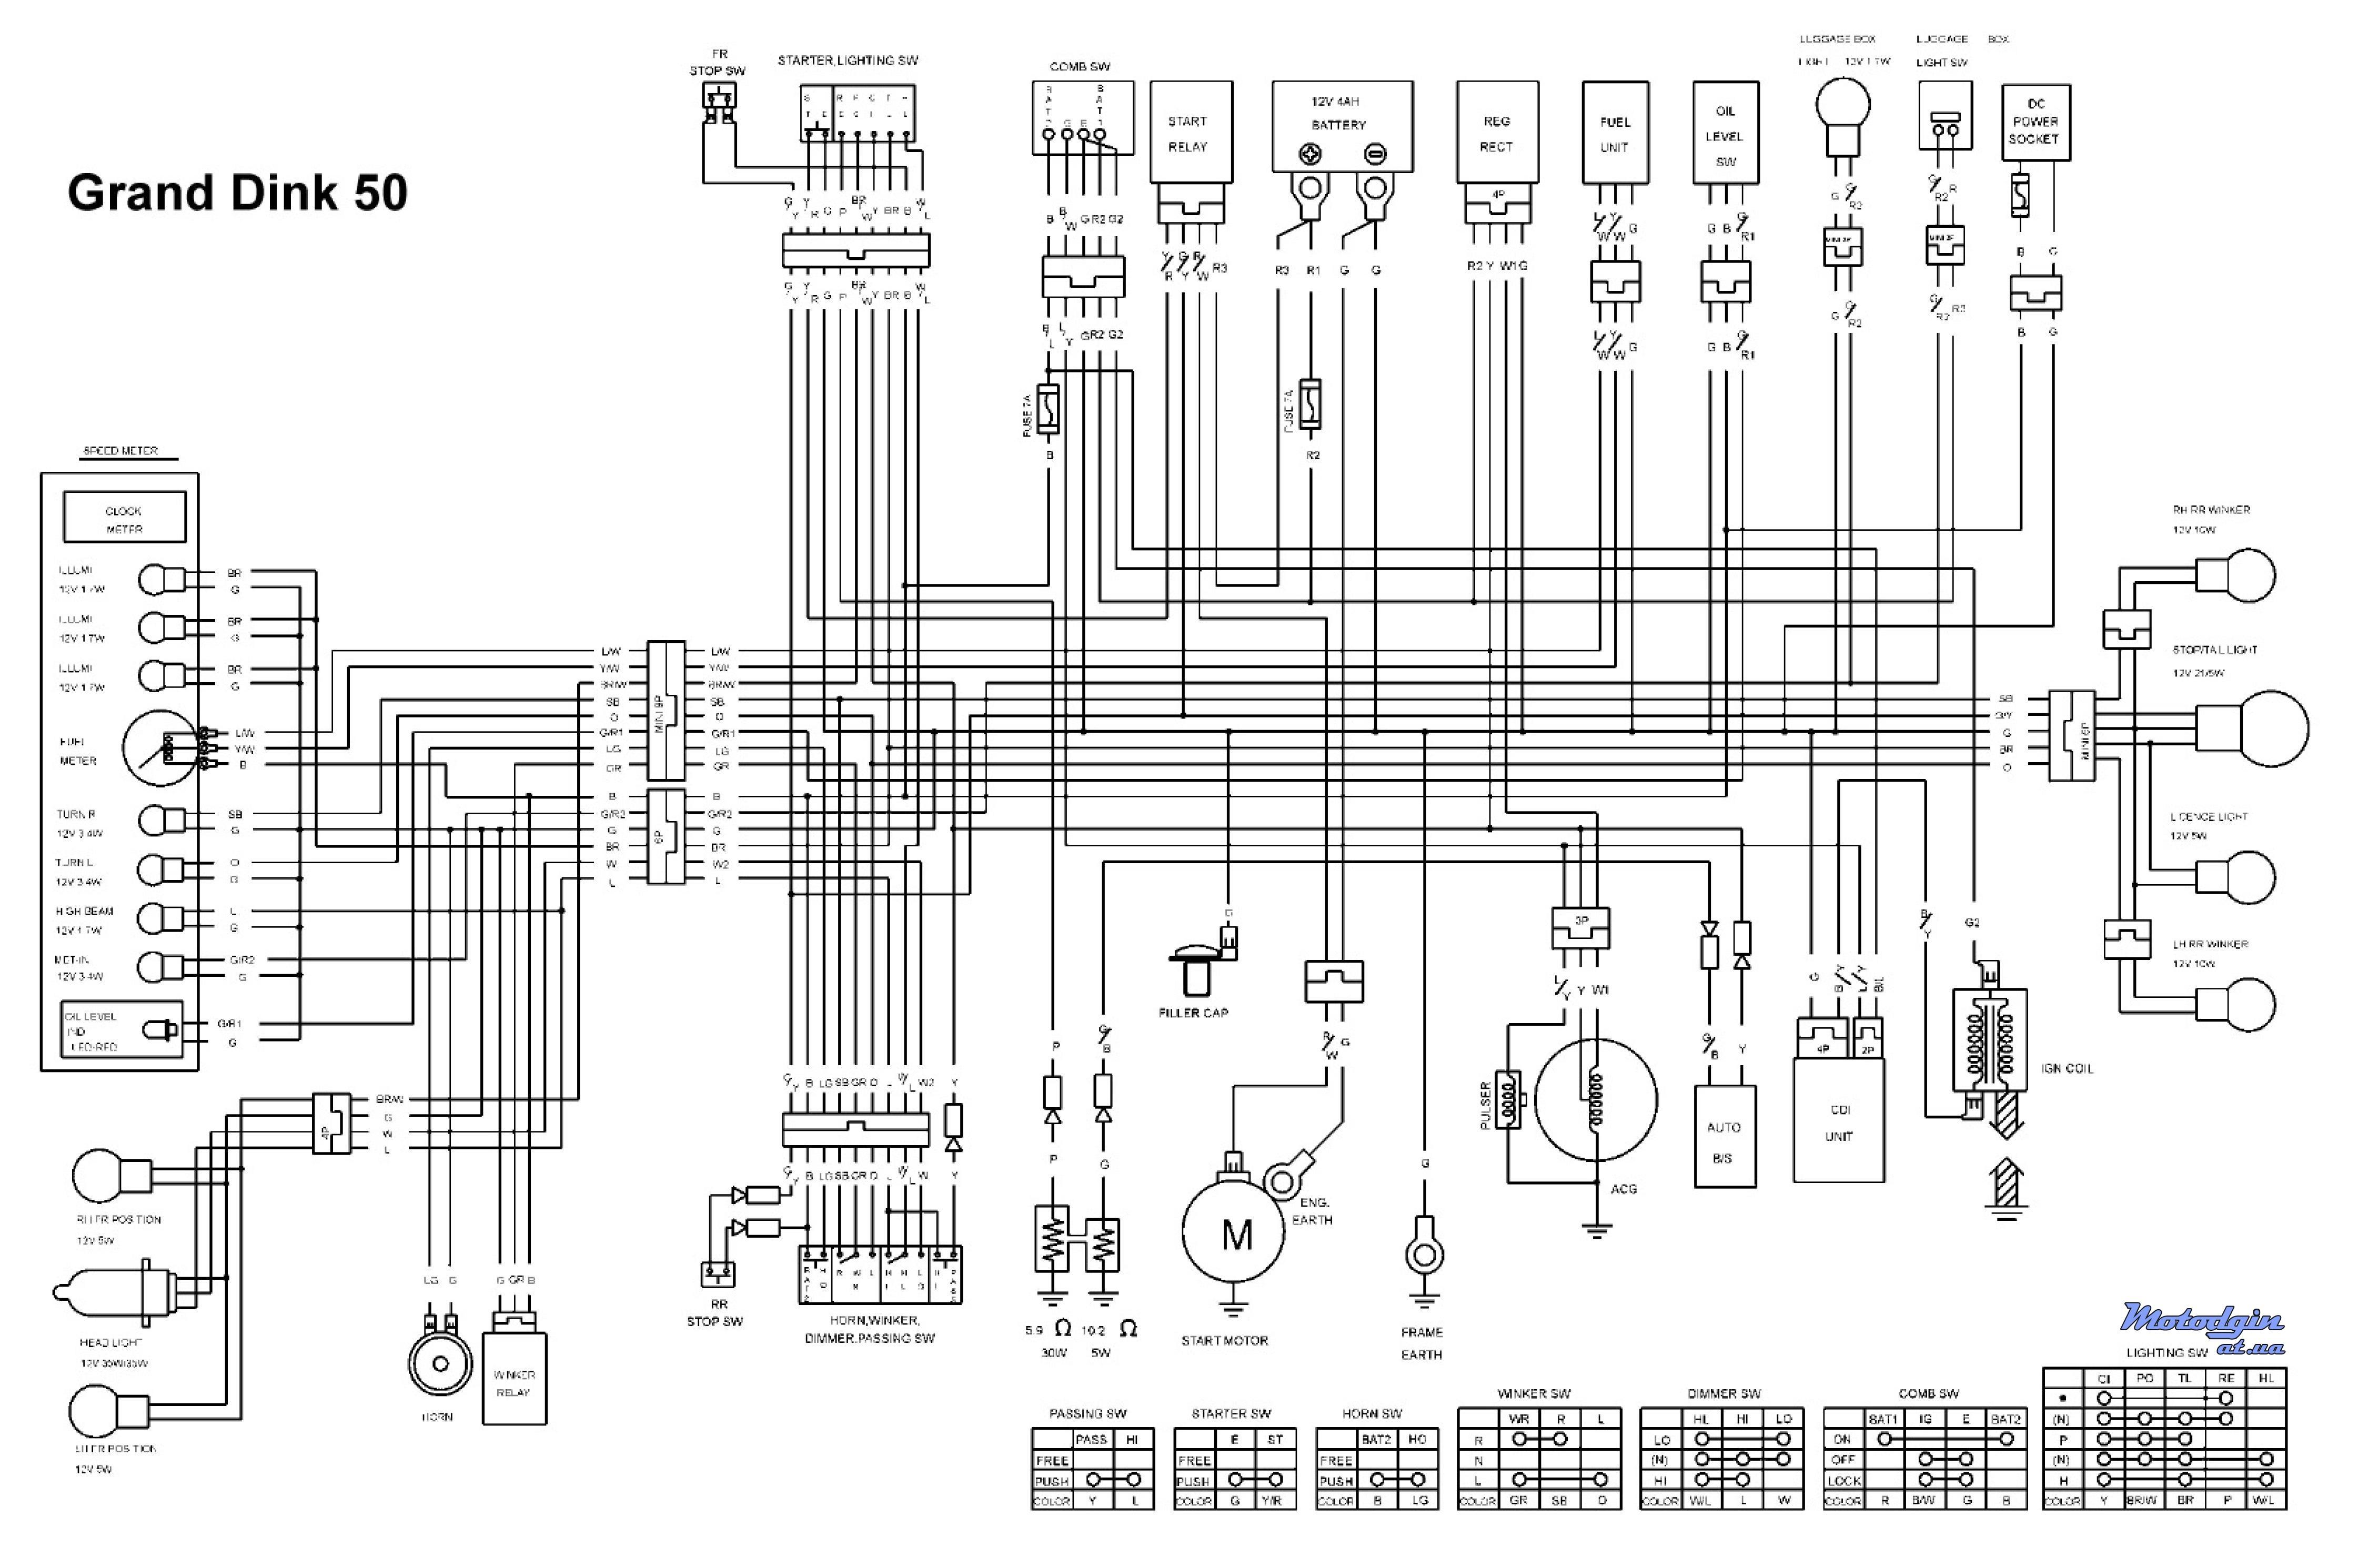 Tao Tao 110 Wiring Diagram Diagram] Tao Tao ata 110 Wiring Diagram Full Version Hd Of Tao Tao 110 Wiring Diagram